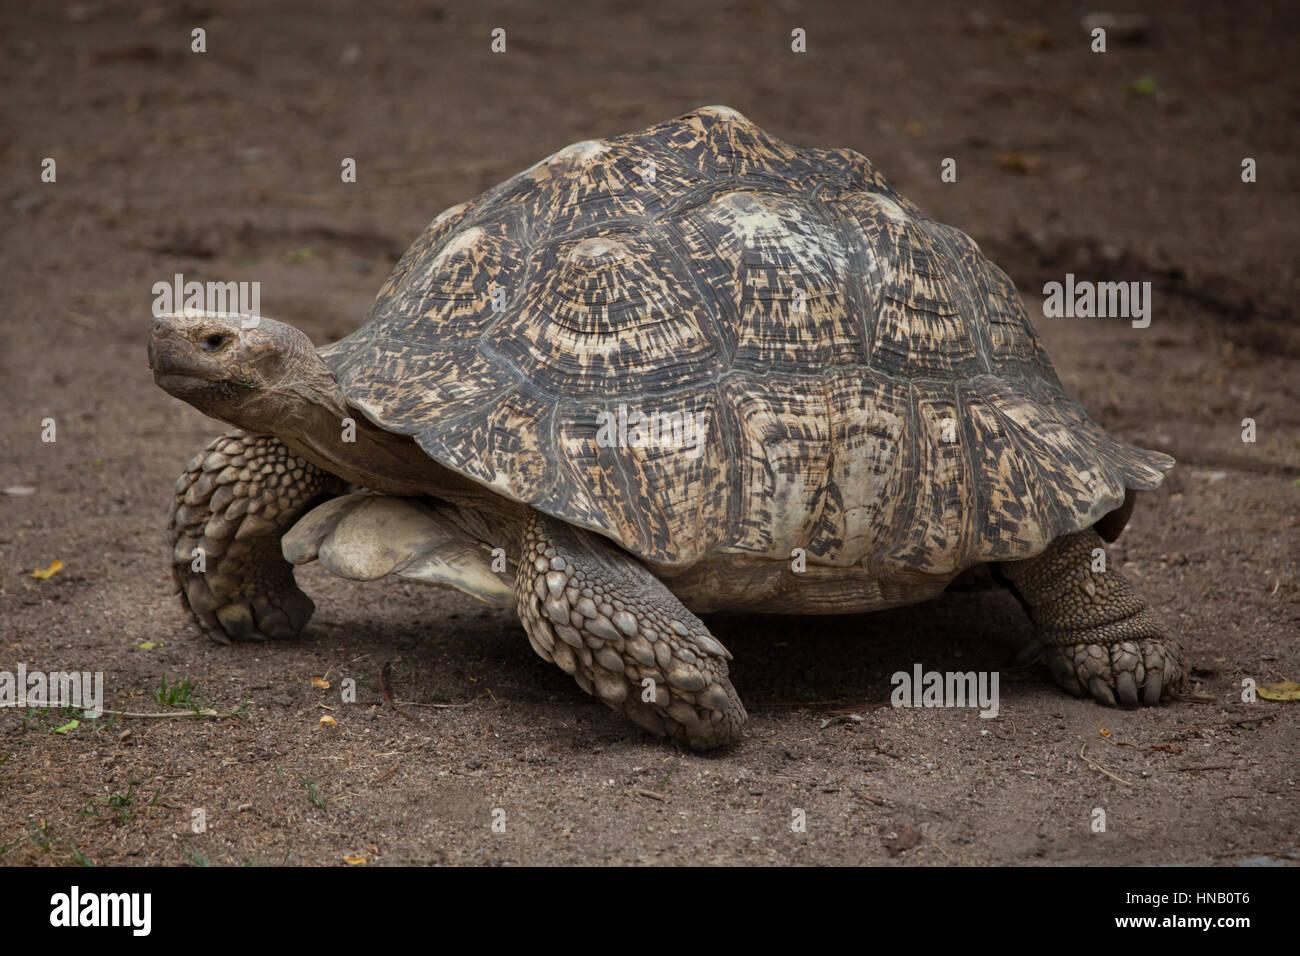 Leopard tortoise (Stigmochelys pardalis). Wildlife animal. - Stock Image